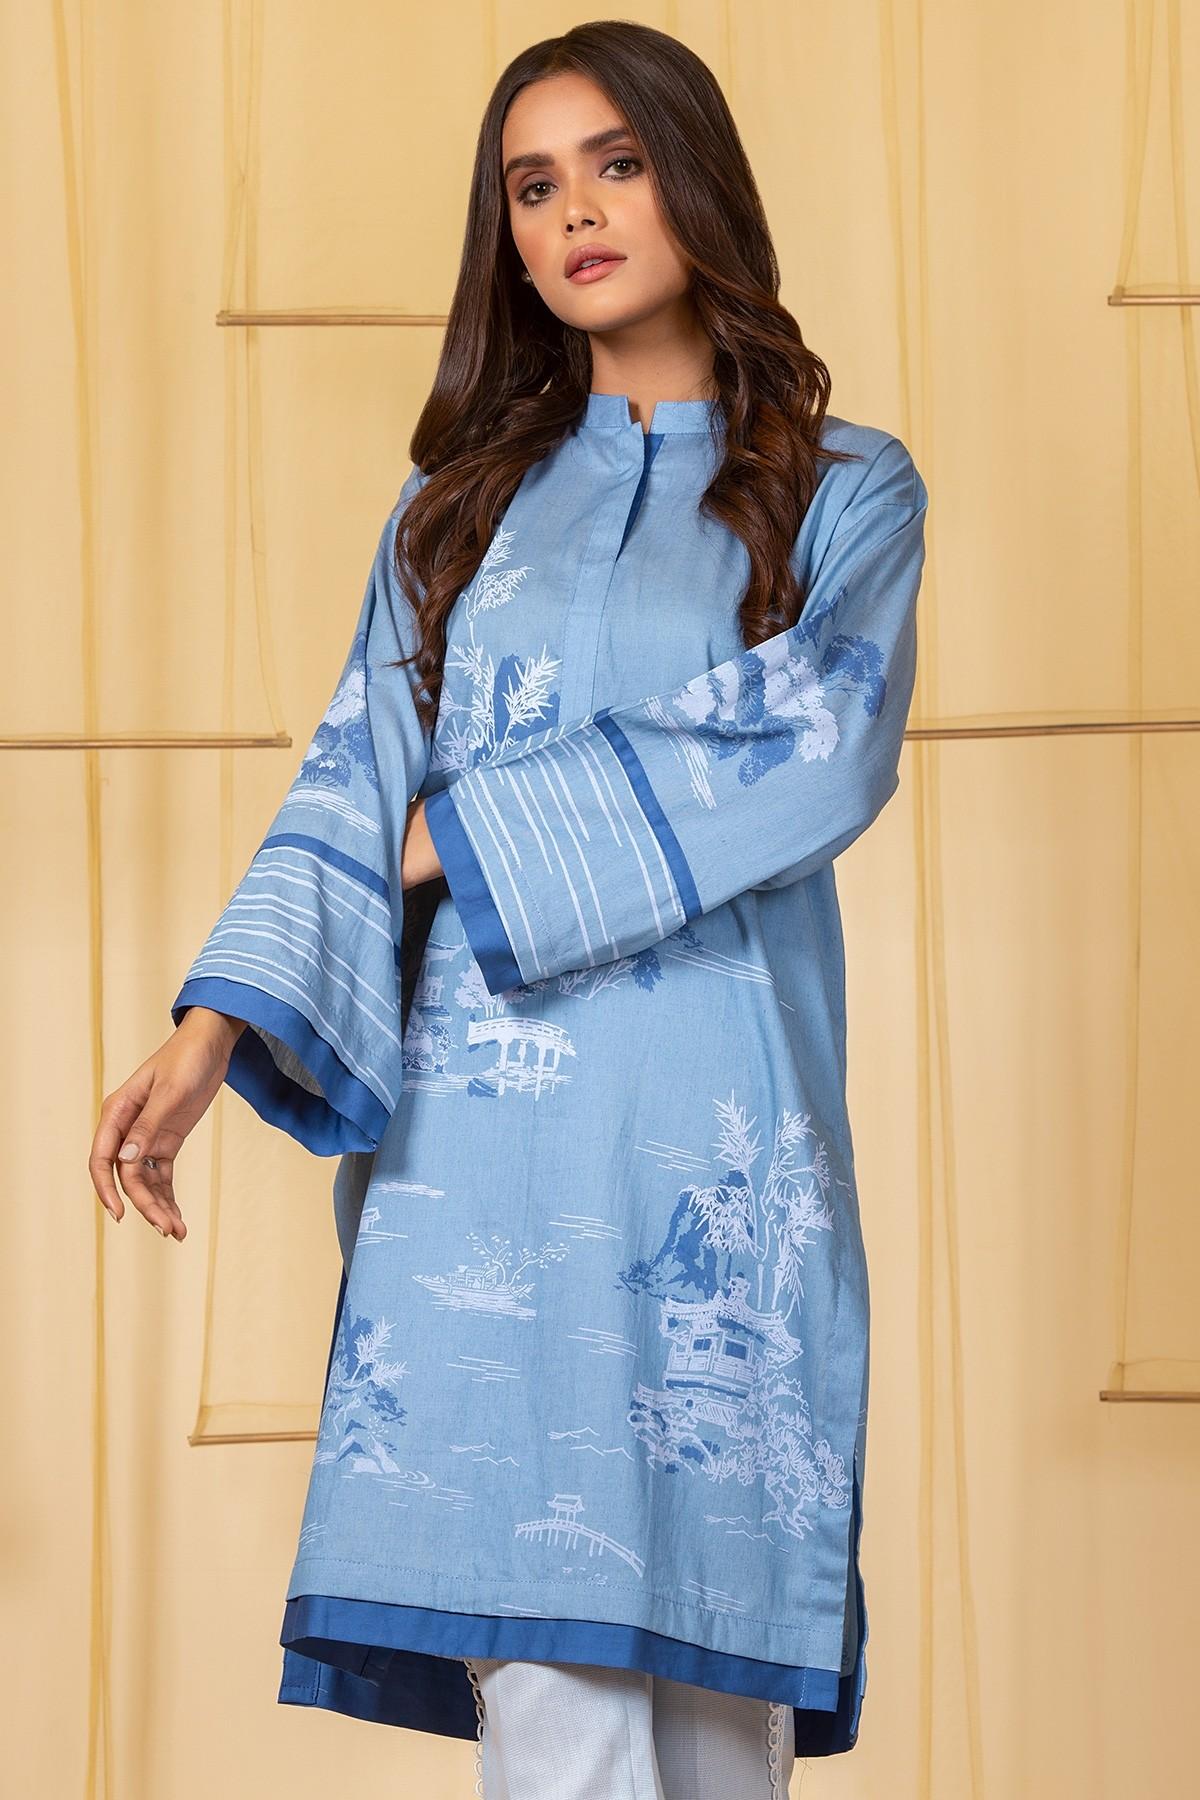 Al-Akaram winter MAK Pret collection Light Blue Yarn Dyed Denim Kurti